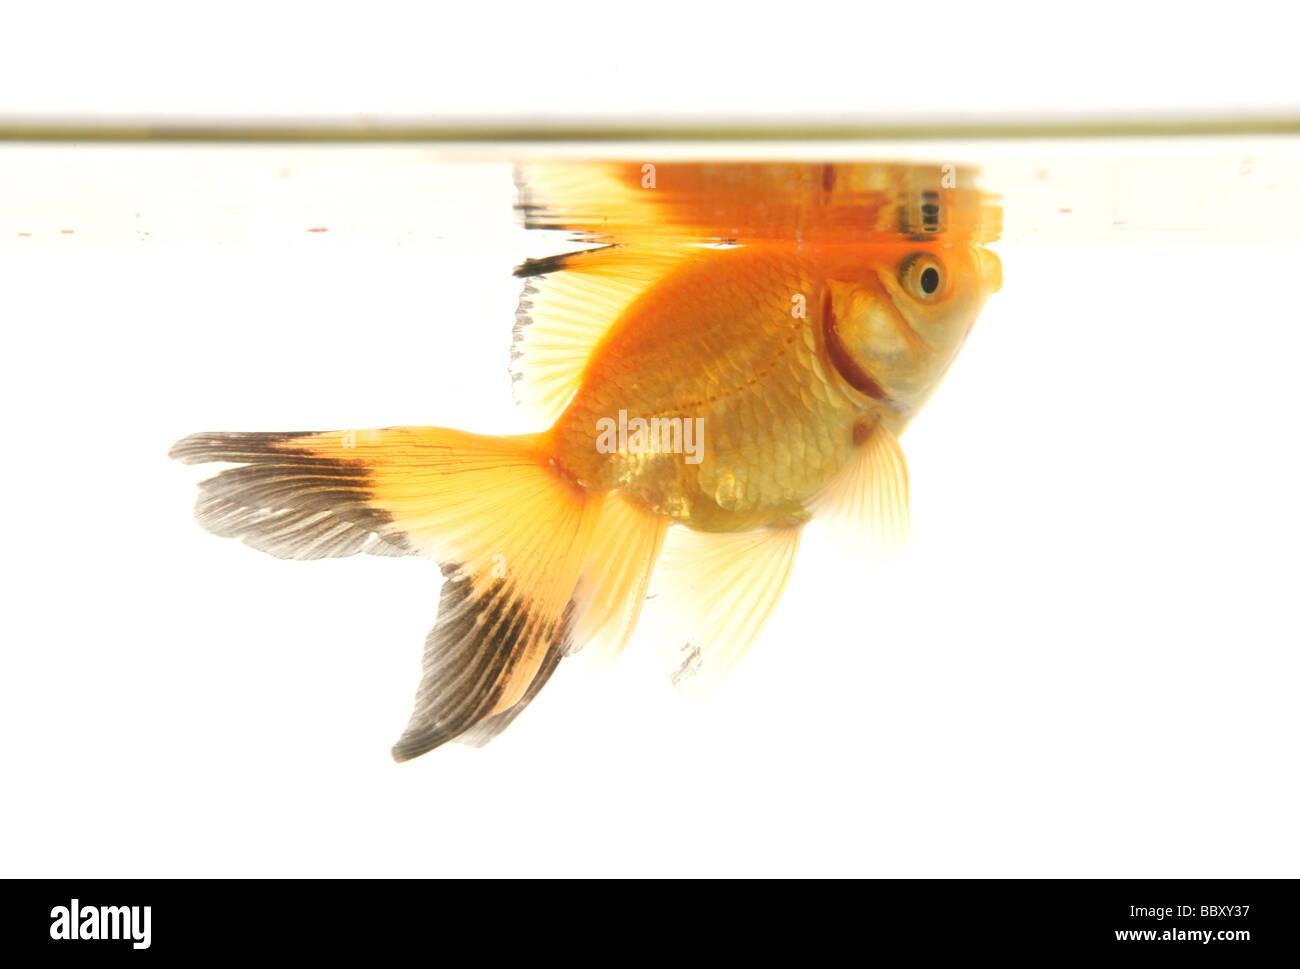 Castillo de popa goldfish recorte retrato studio Imagen De Stock